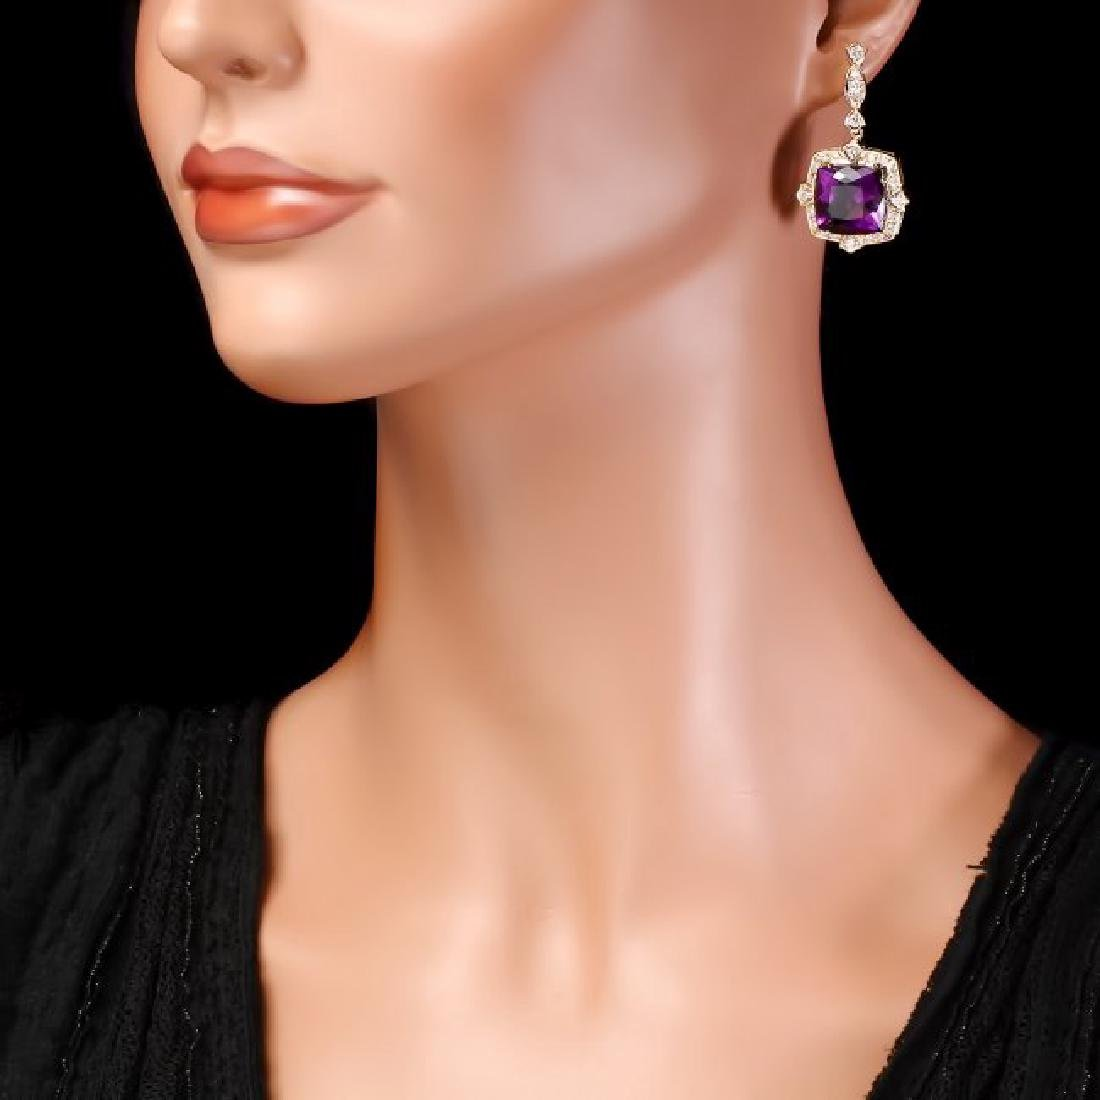 14k Gold 23ct Amethyst 1.6ct Diamond Earrings - 4